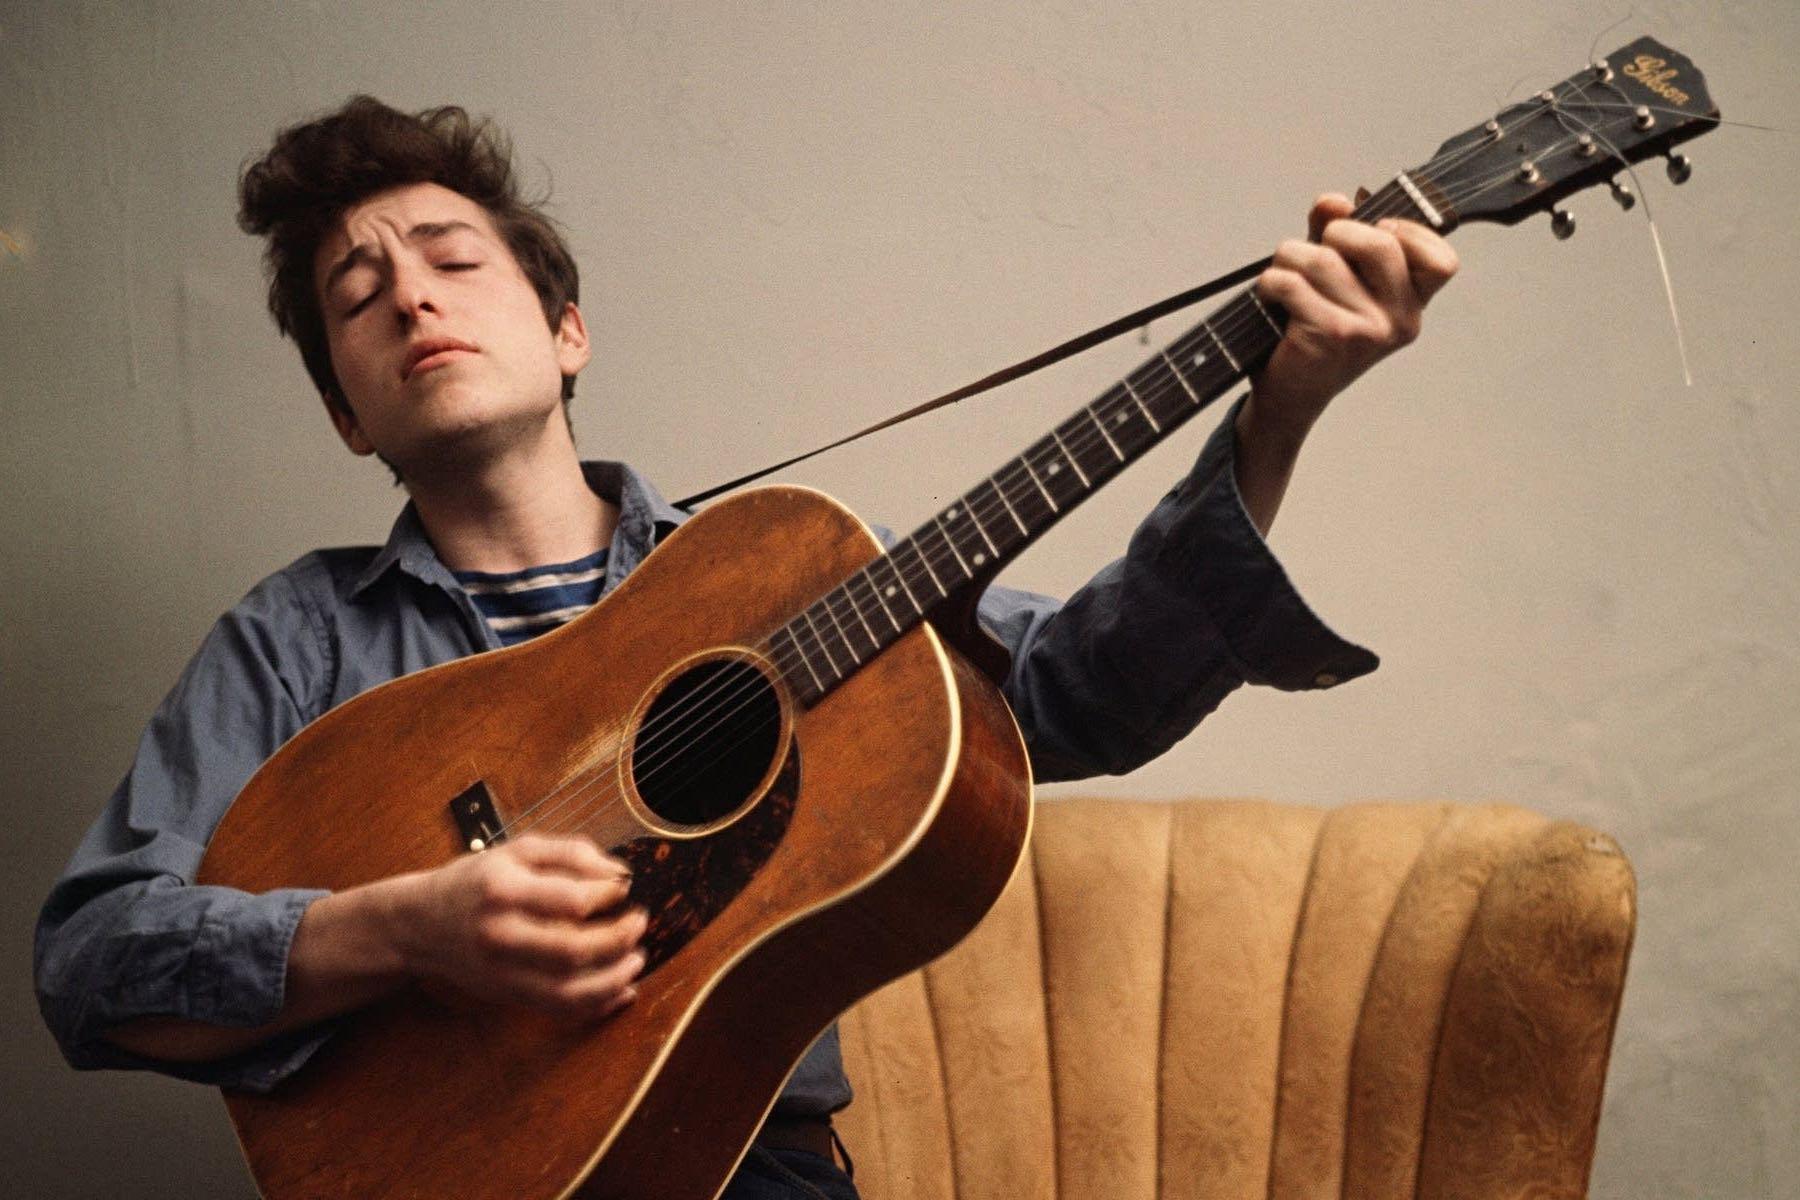 Bob Dylan playing a guitar